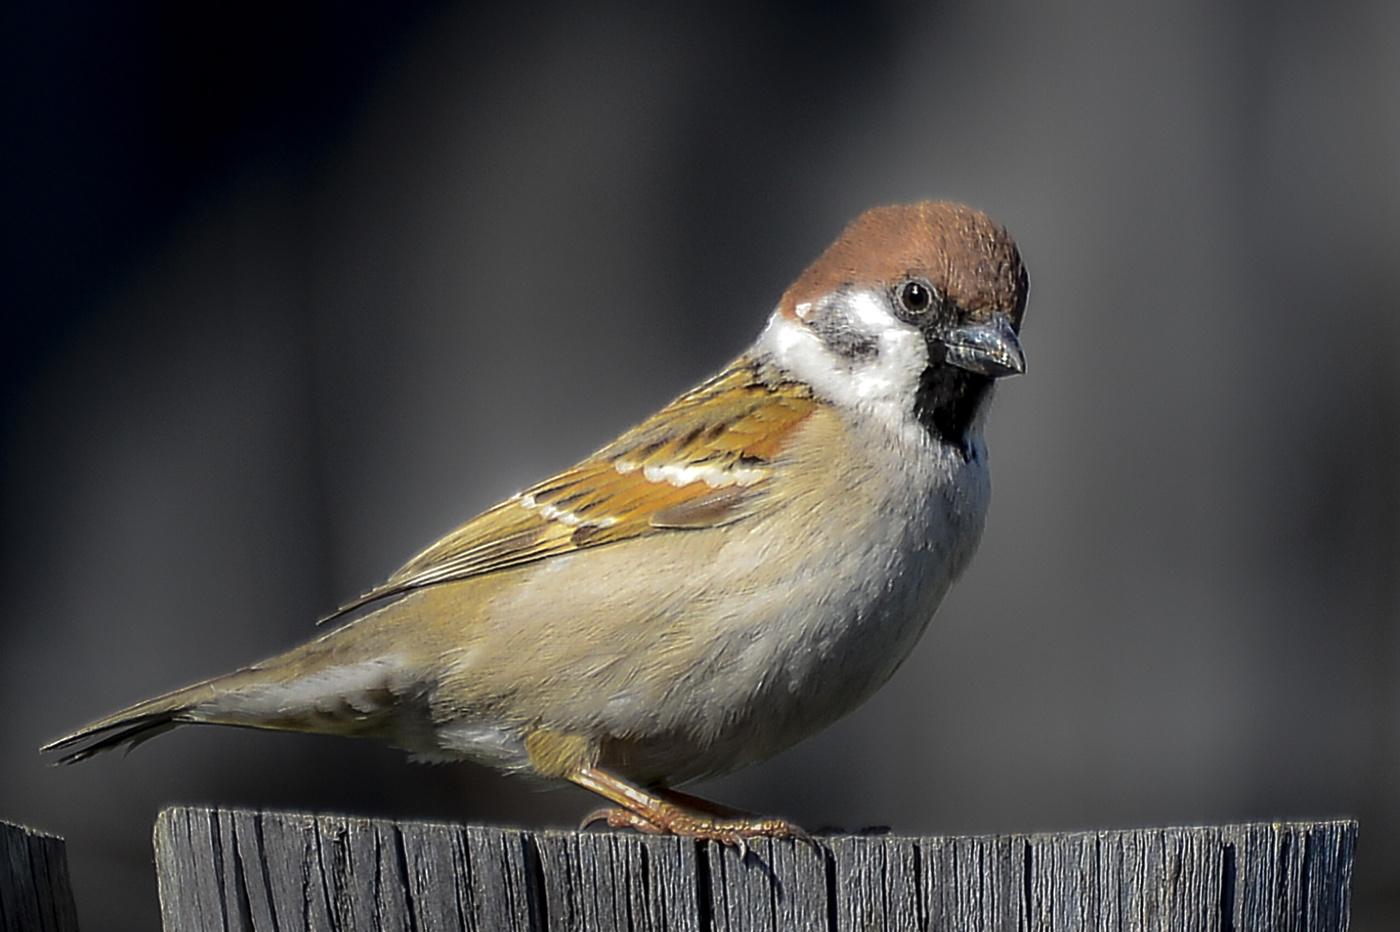 бушин все о птице воробей в картинках съемки различных жанрах